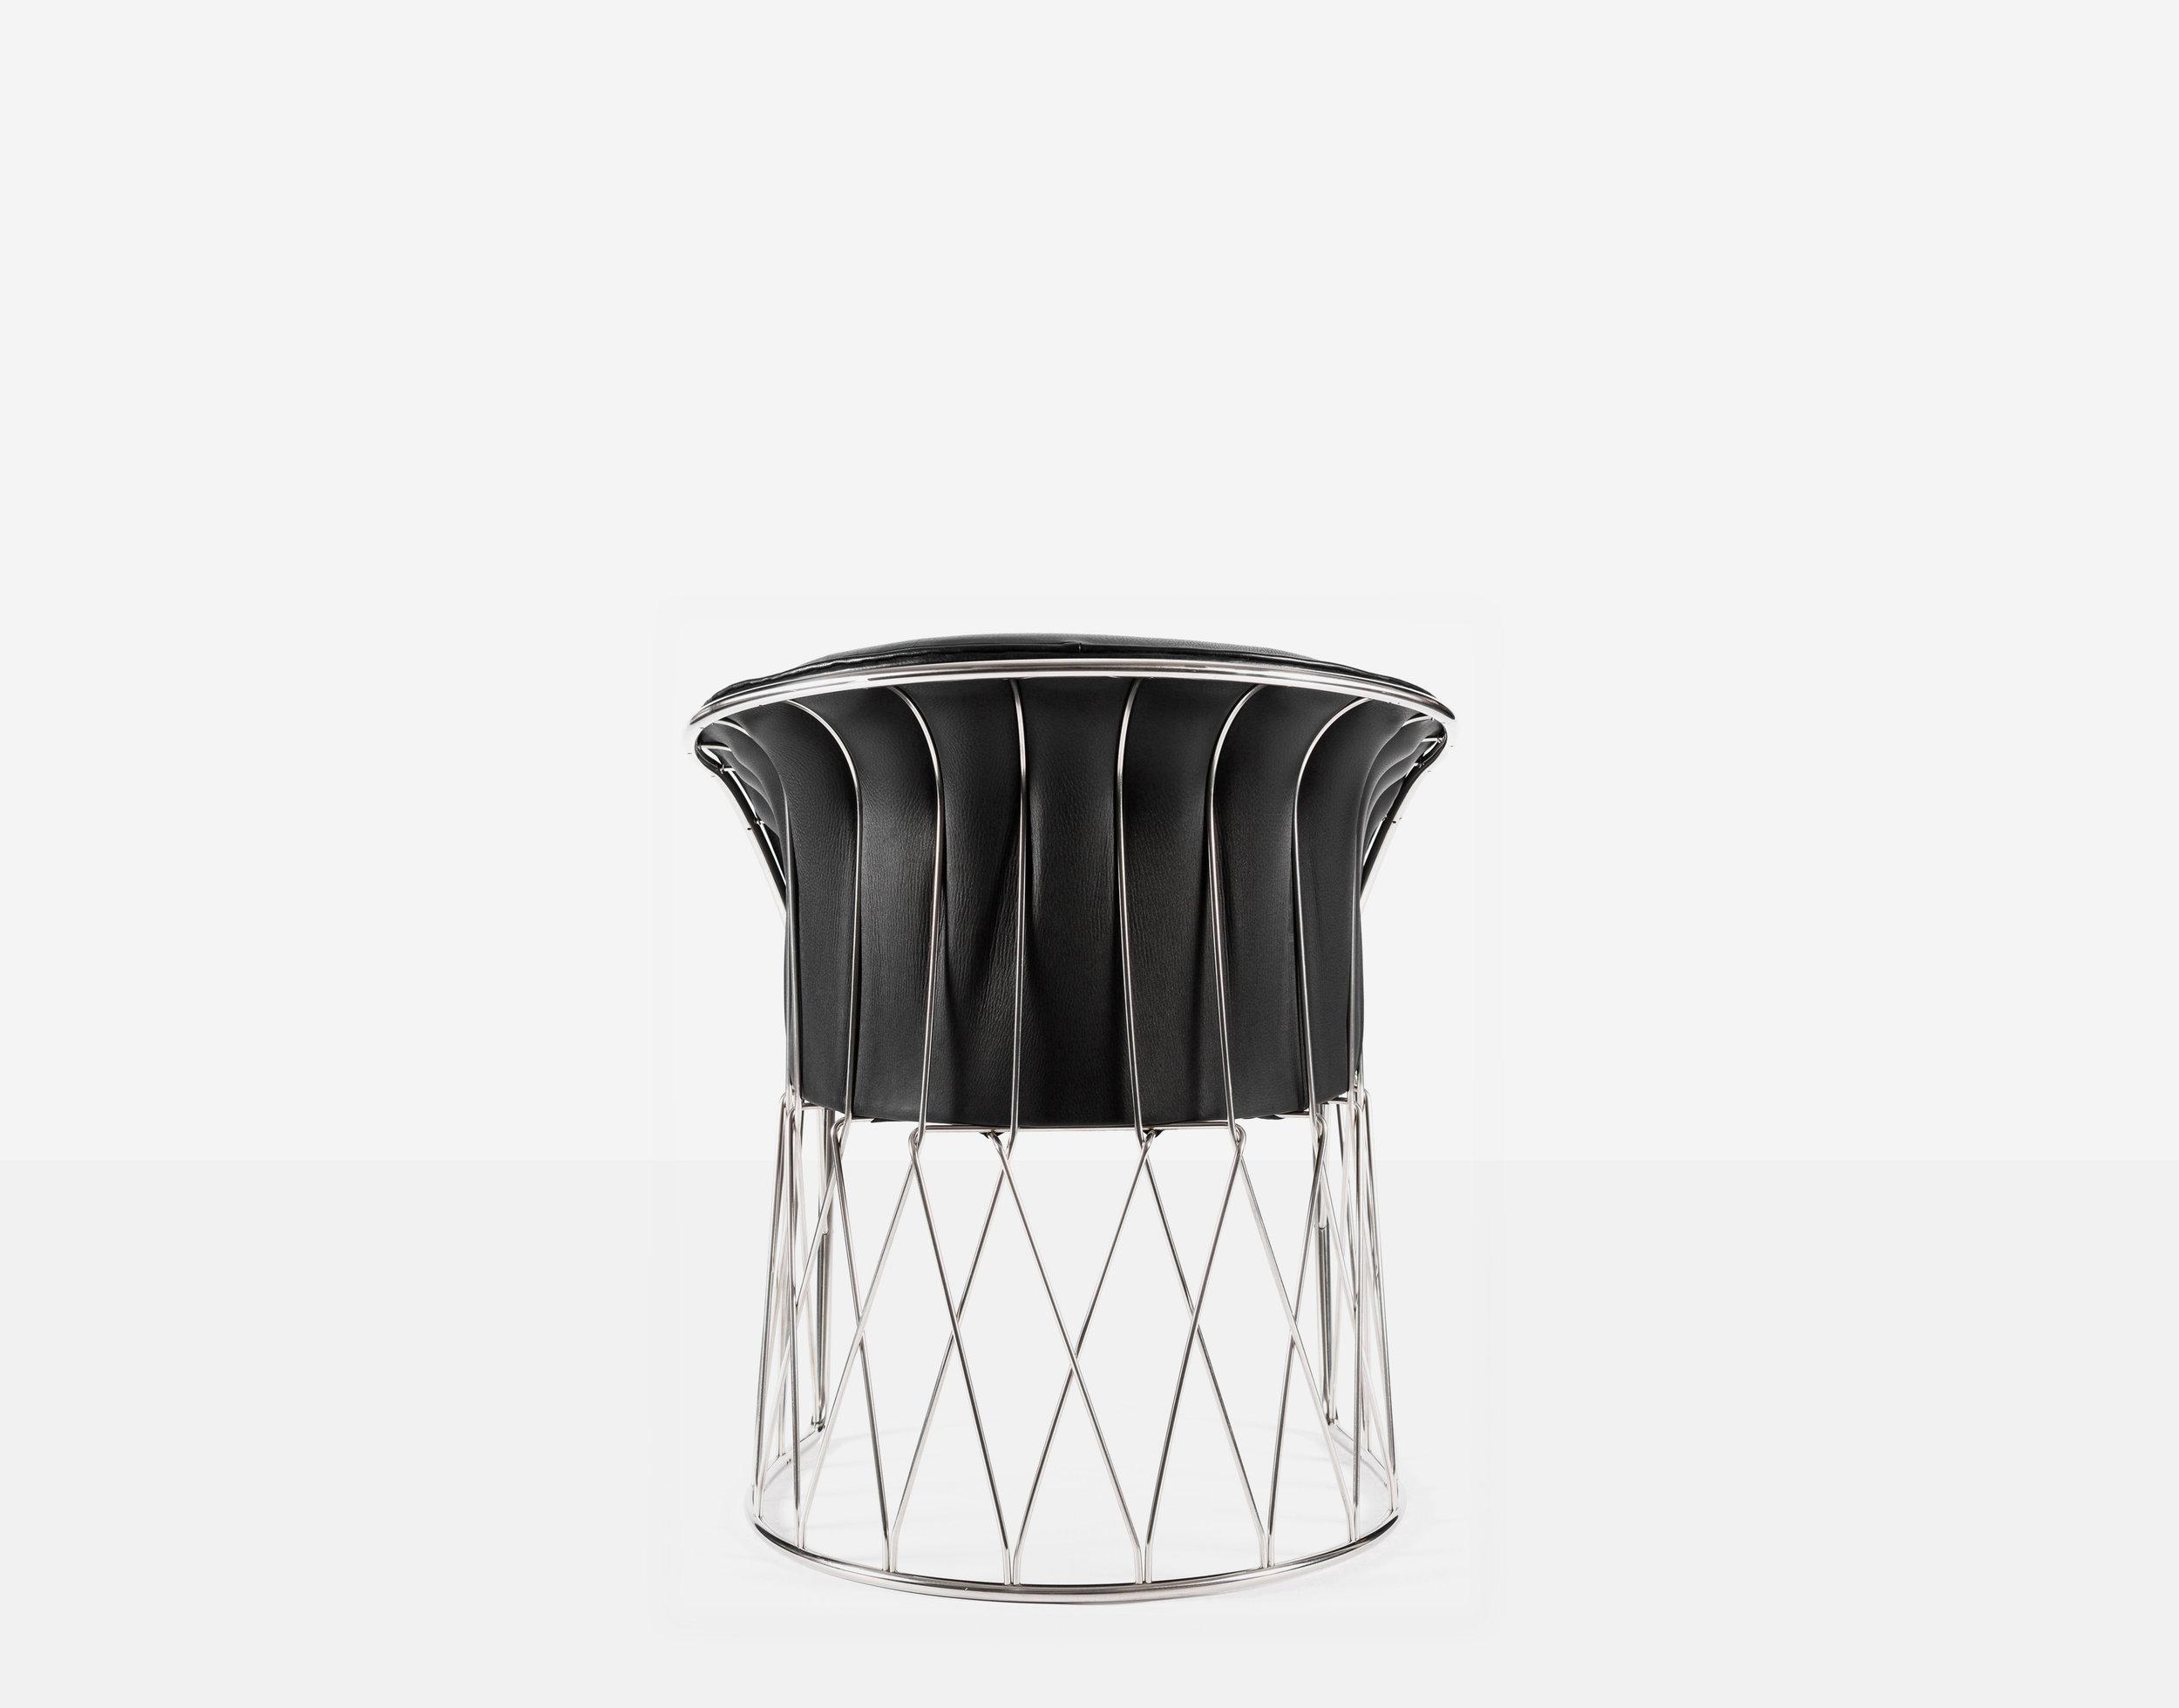 Luteca_PRV_Equipal-Chair_Black-Leather-Chrome_B-W.jpg